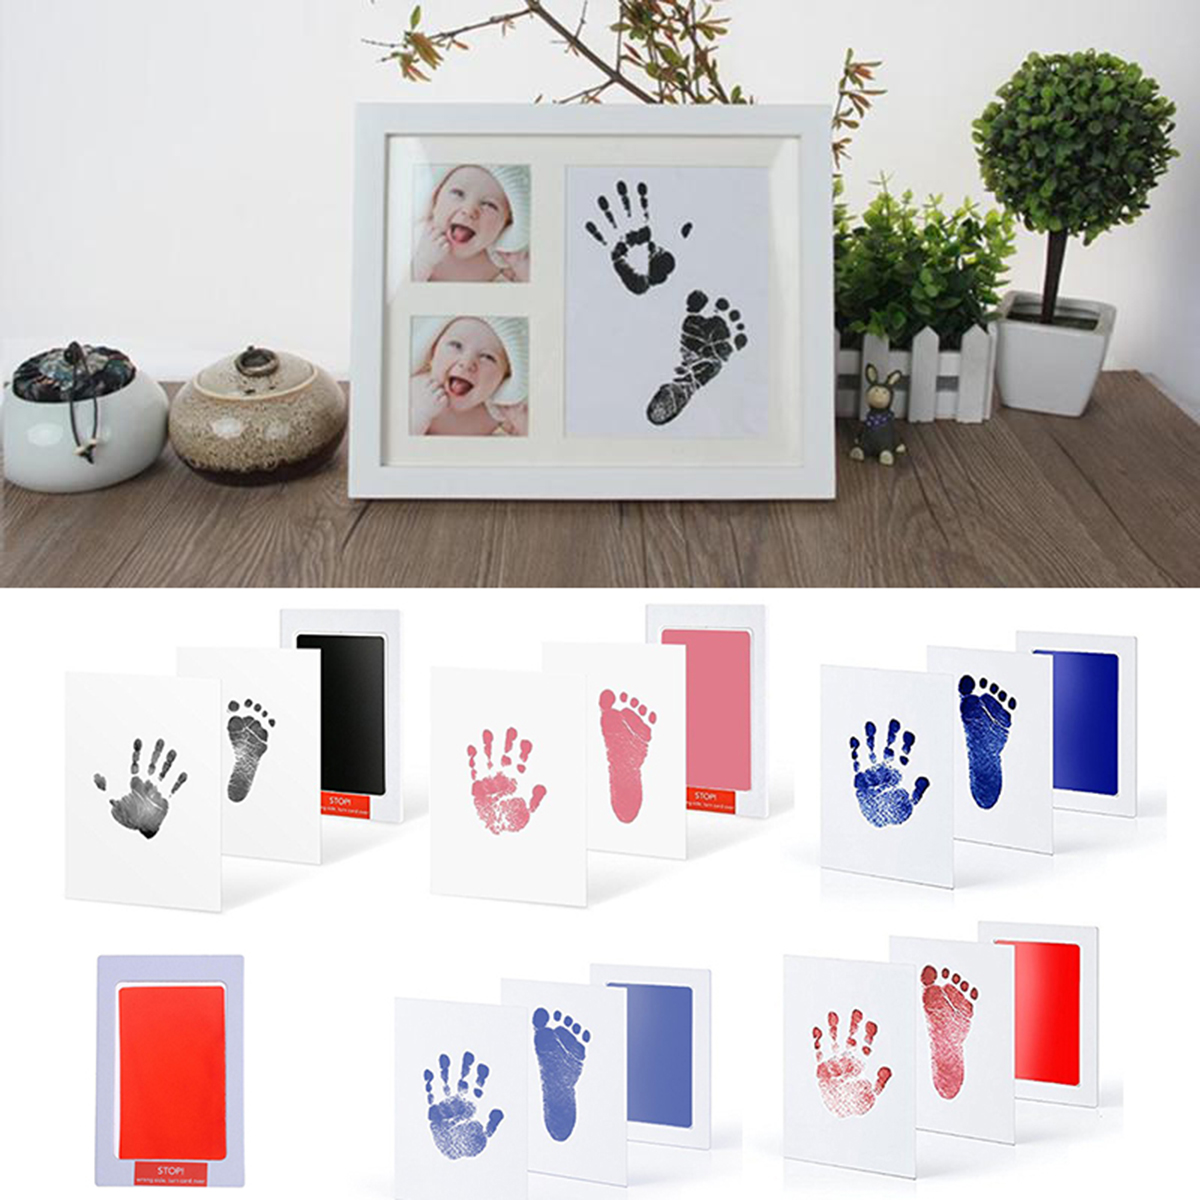 Baby Care Non-Toxic Baby Photo Frame DIY Handprint Footprint Imprint Kit Baby Souvenirs Casting Clay Print Newborn Ink Pad Toys